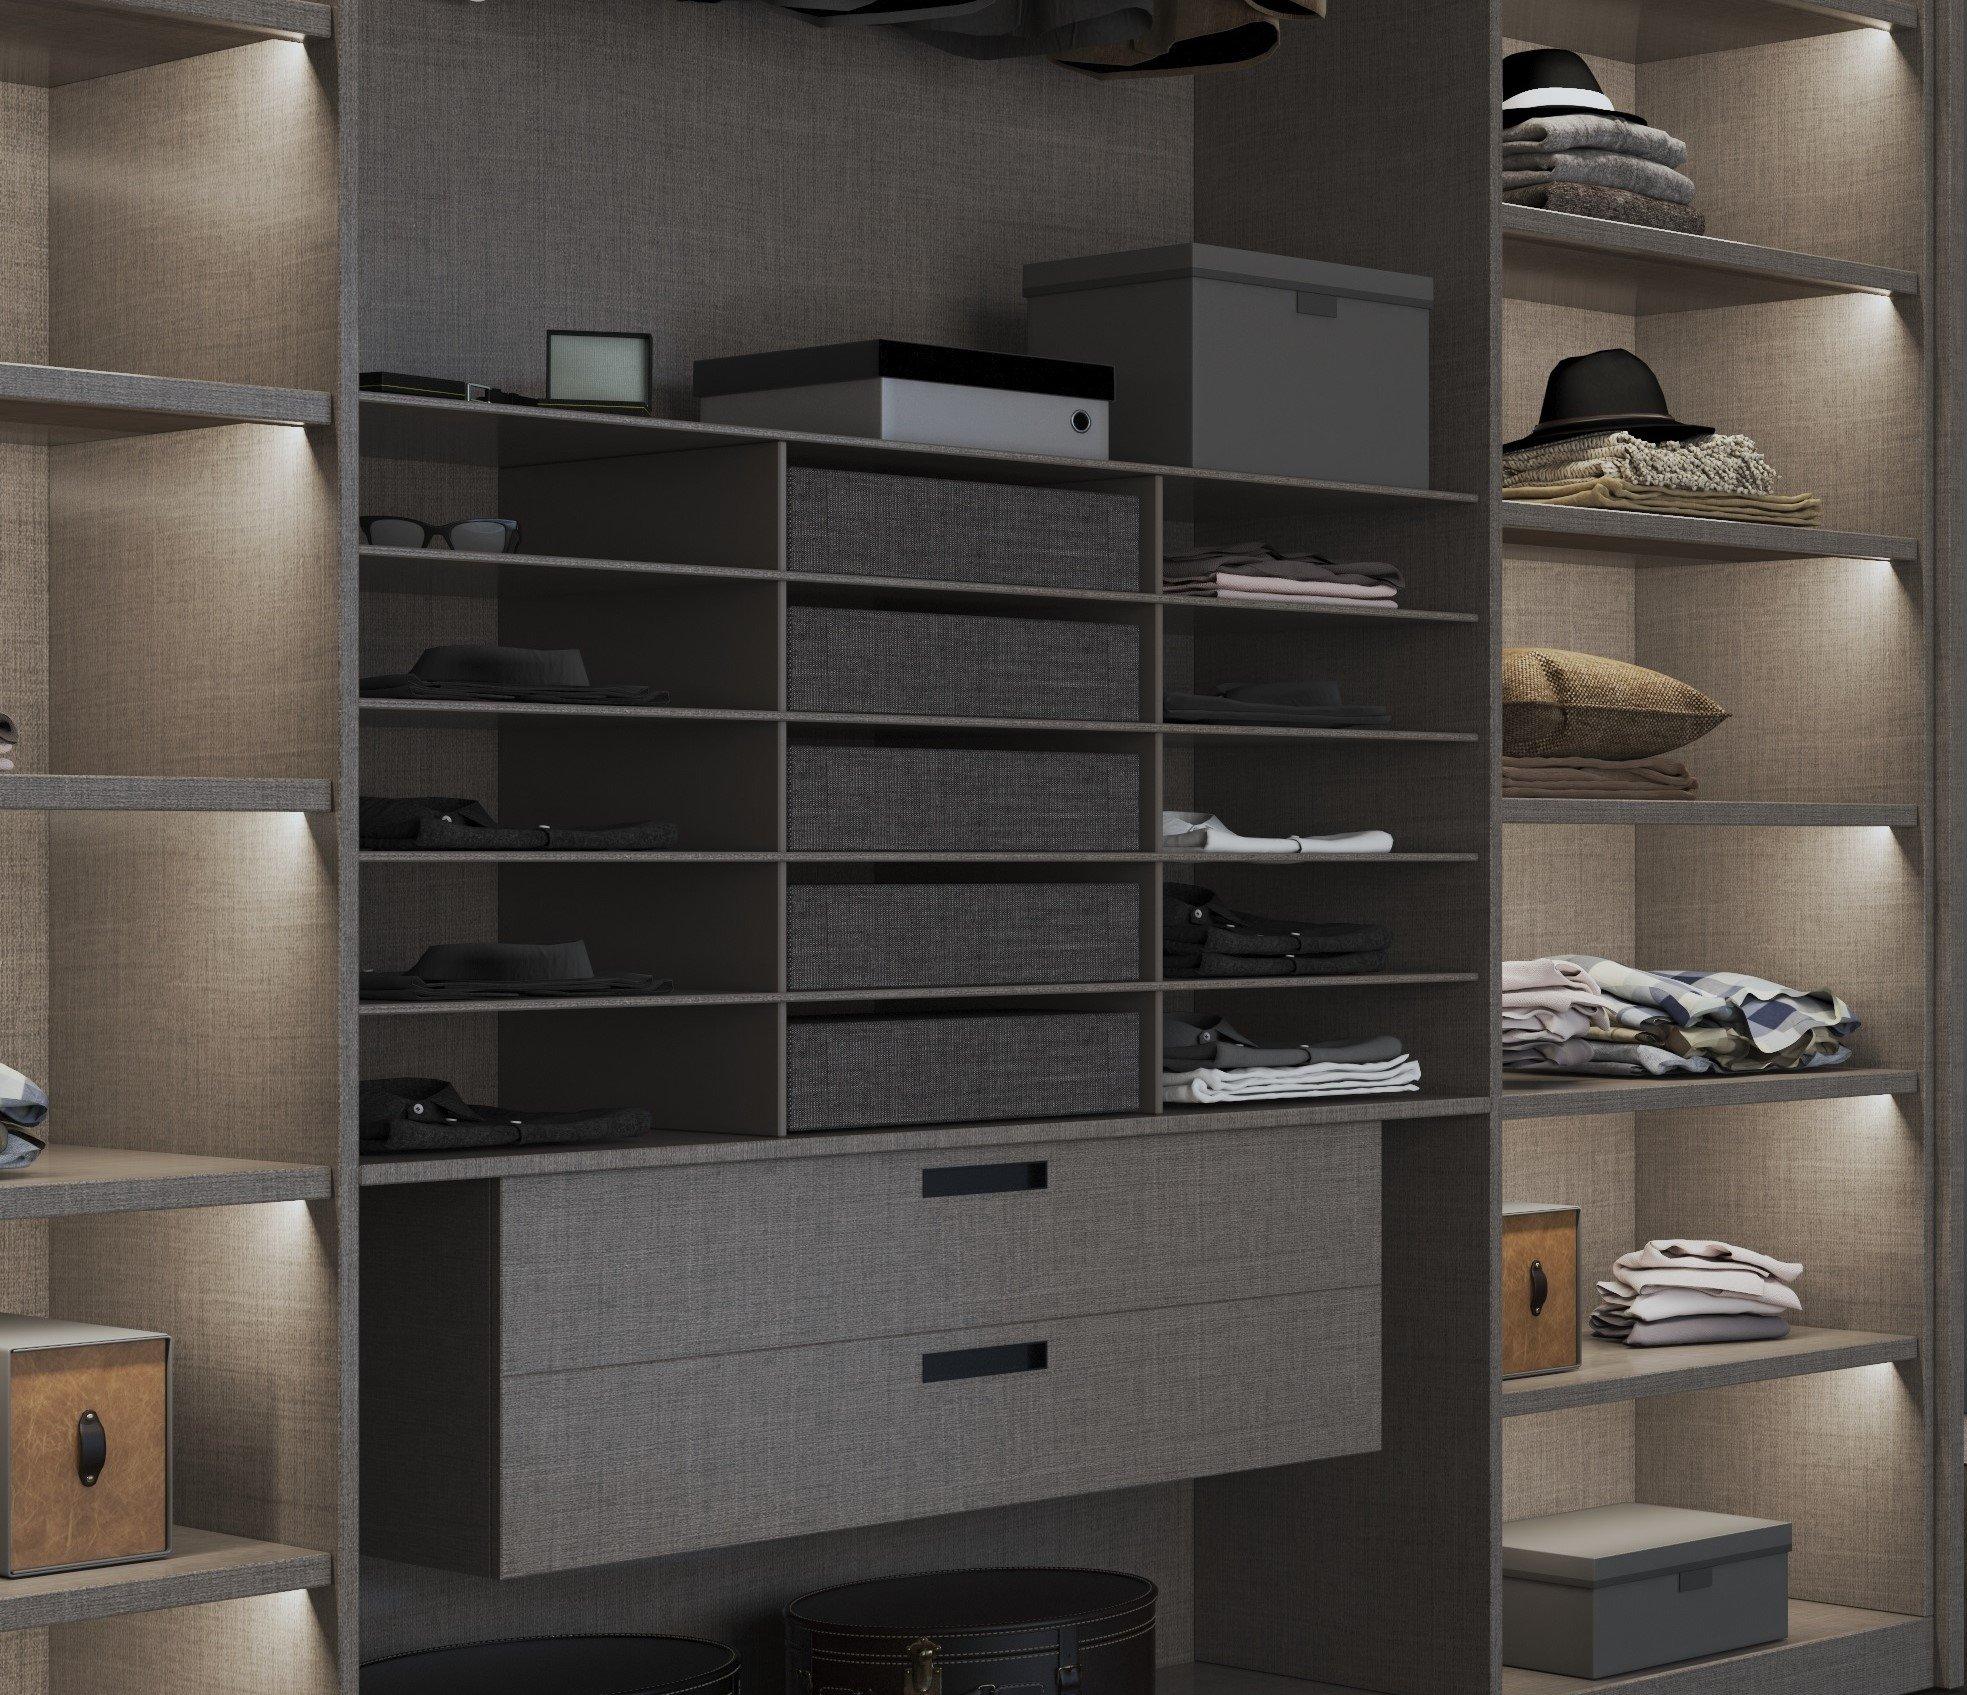 Walk-in Wardrobe Storage